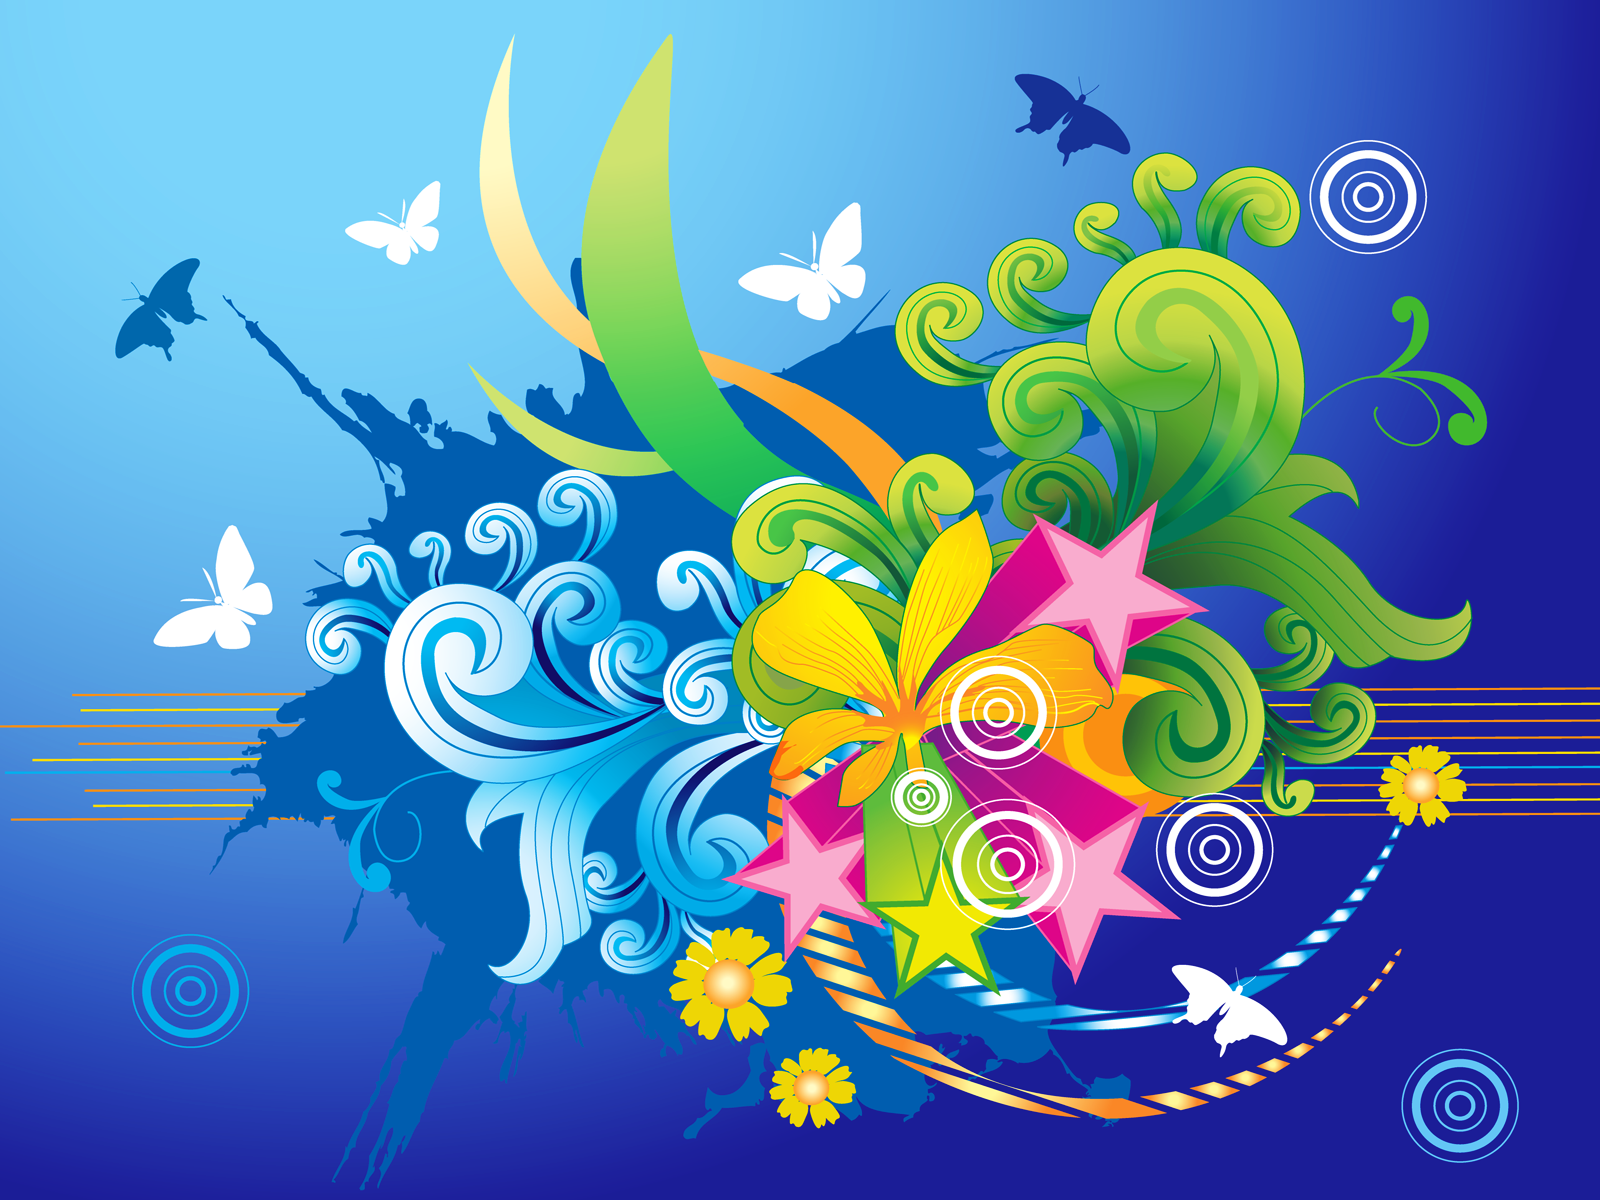 http://4.bp.blogspot.com/-7fwSnc5SSDI/Tu9jR-ZysFI/AAAAAAAAAsc/pCPZfZSckLE/s1600/blue-pop-art-wall-inkbluesky.png